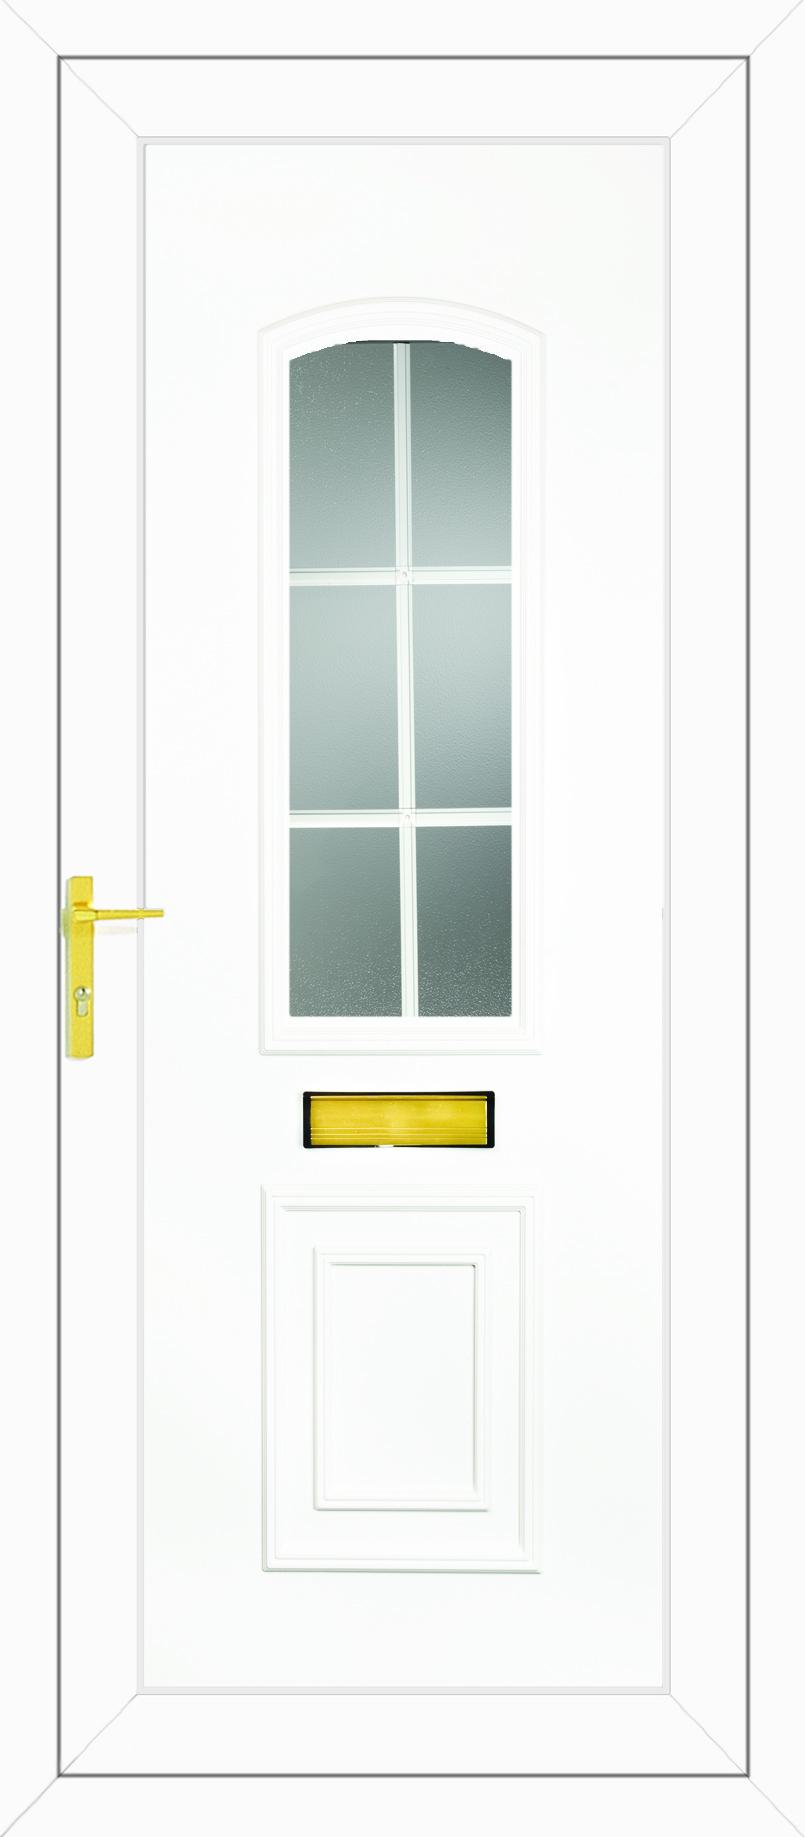 R400 georgian bar upvc front door for Upvc french doors with georgian bar